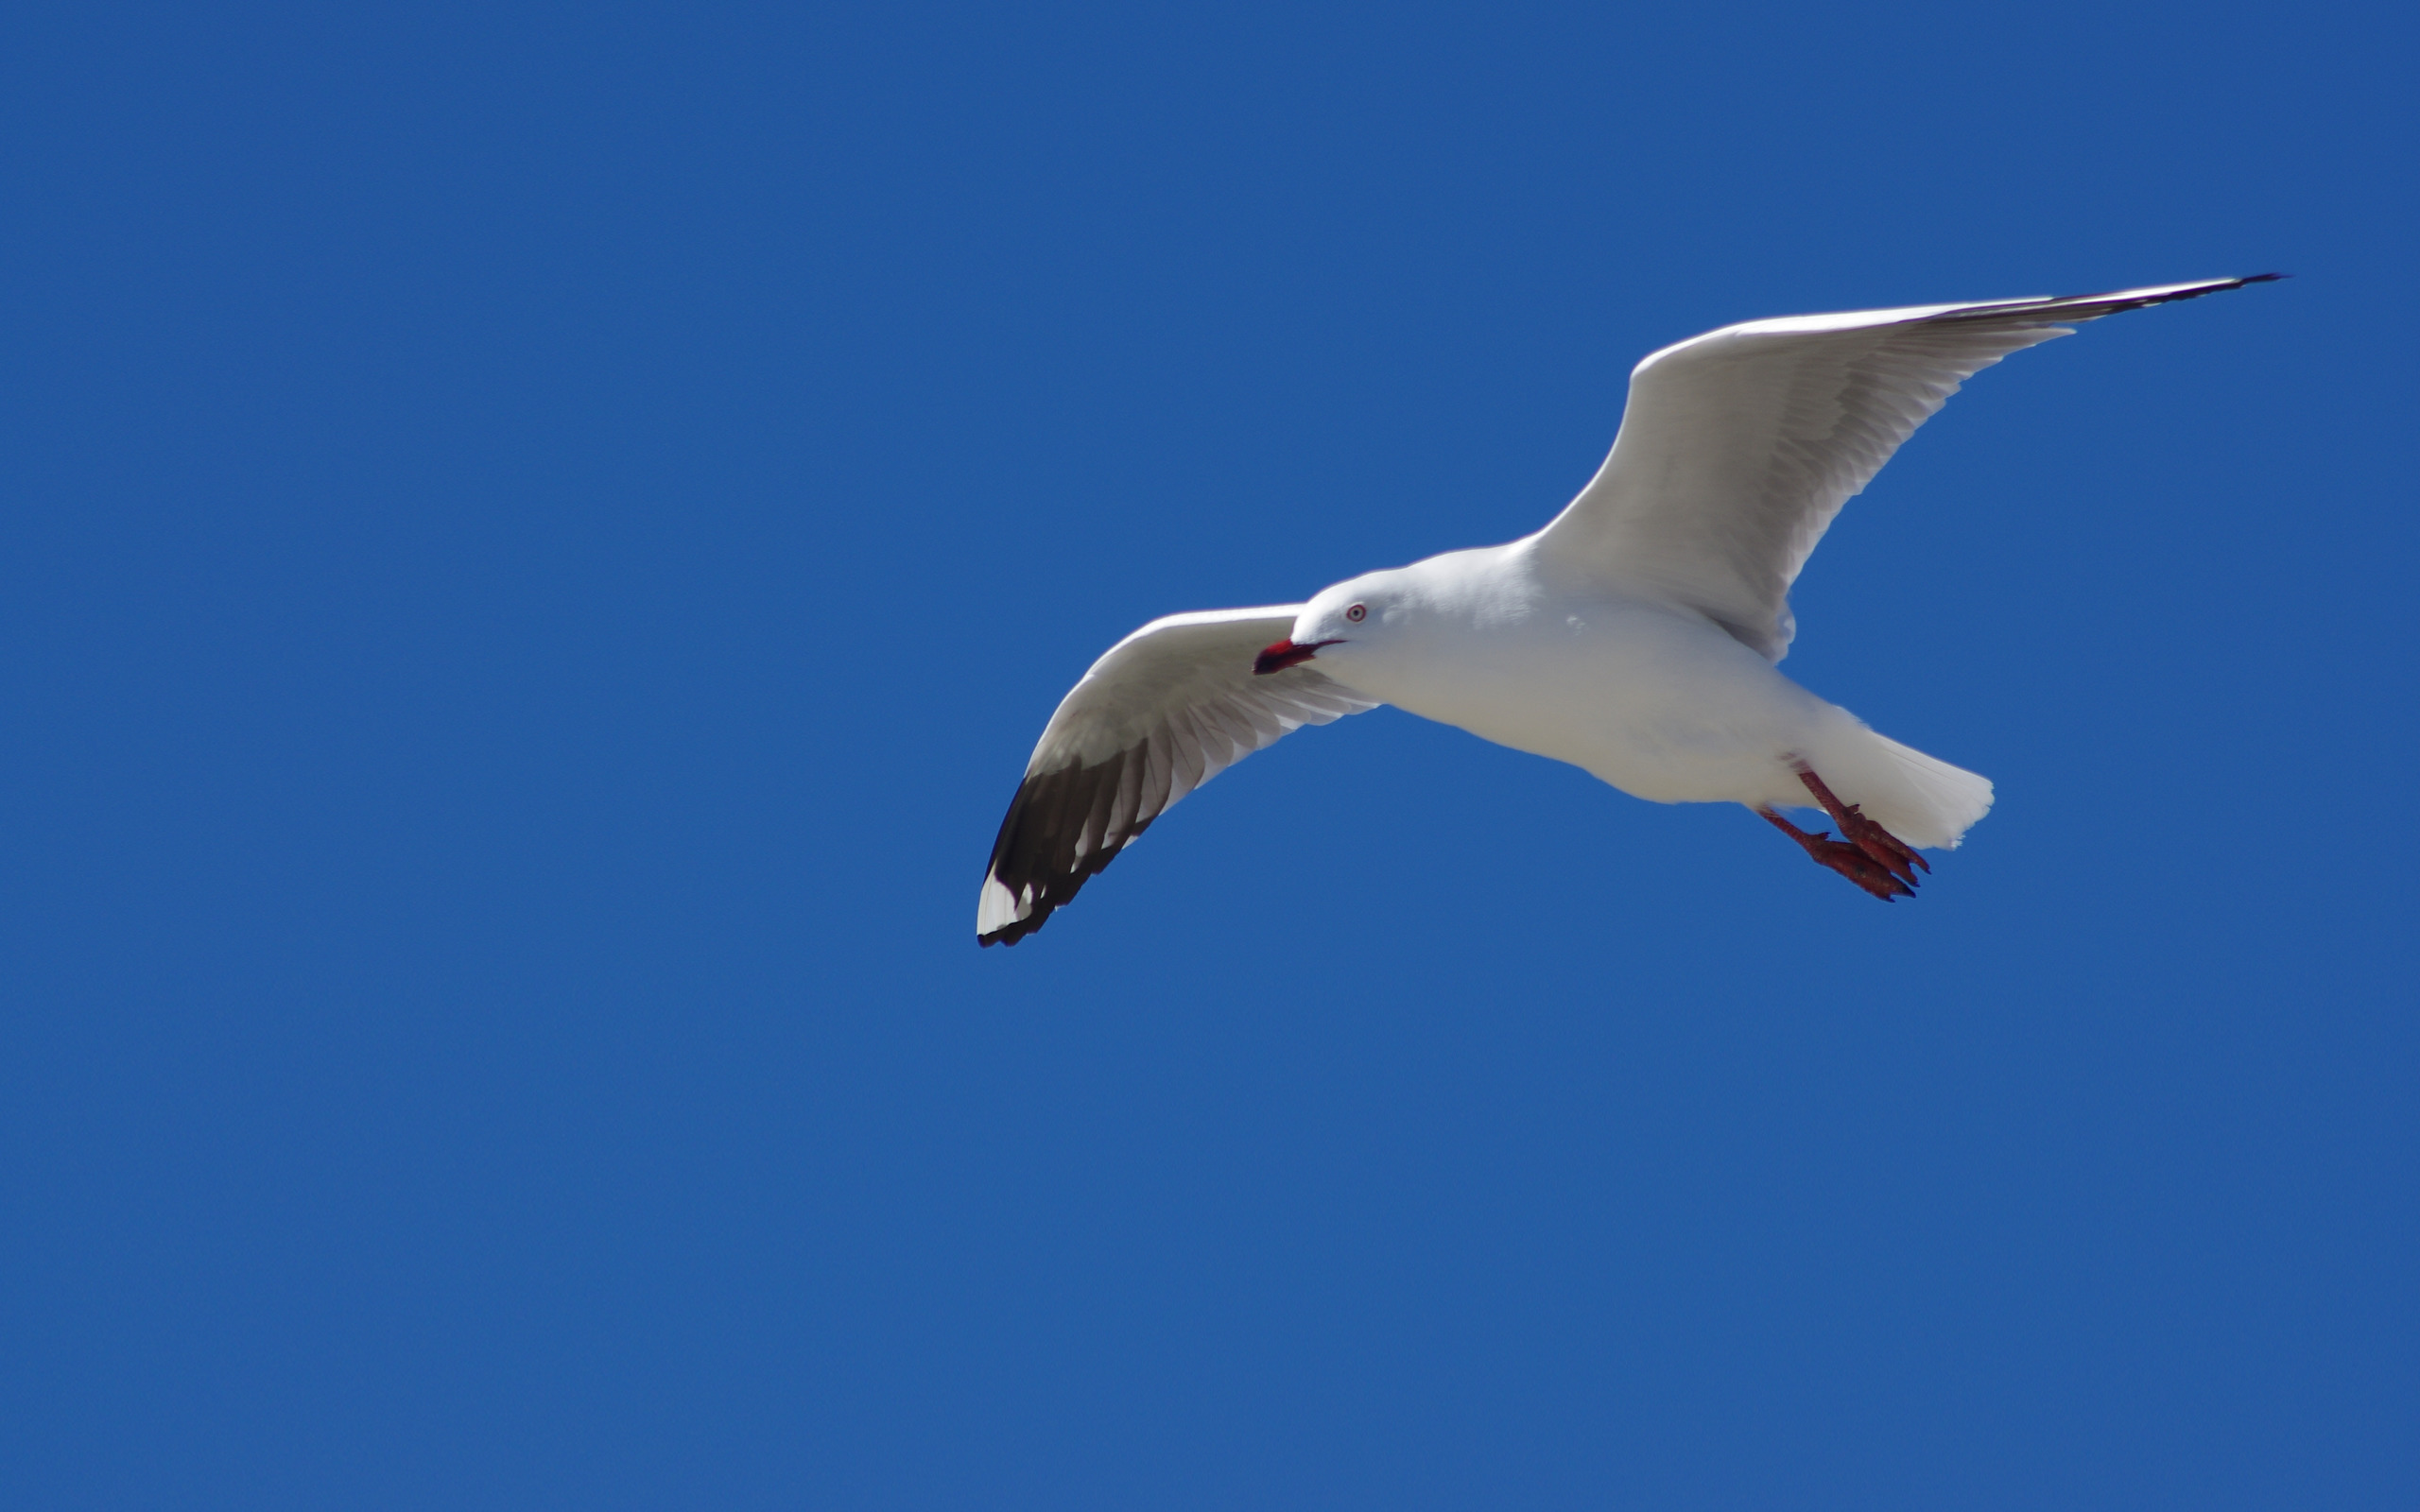 flying-bird2.jpg